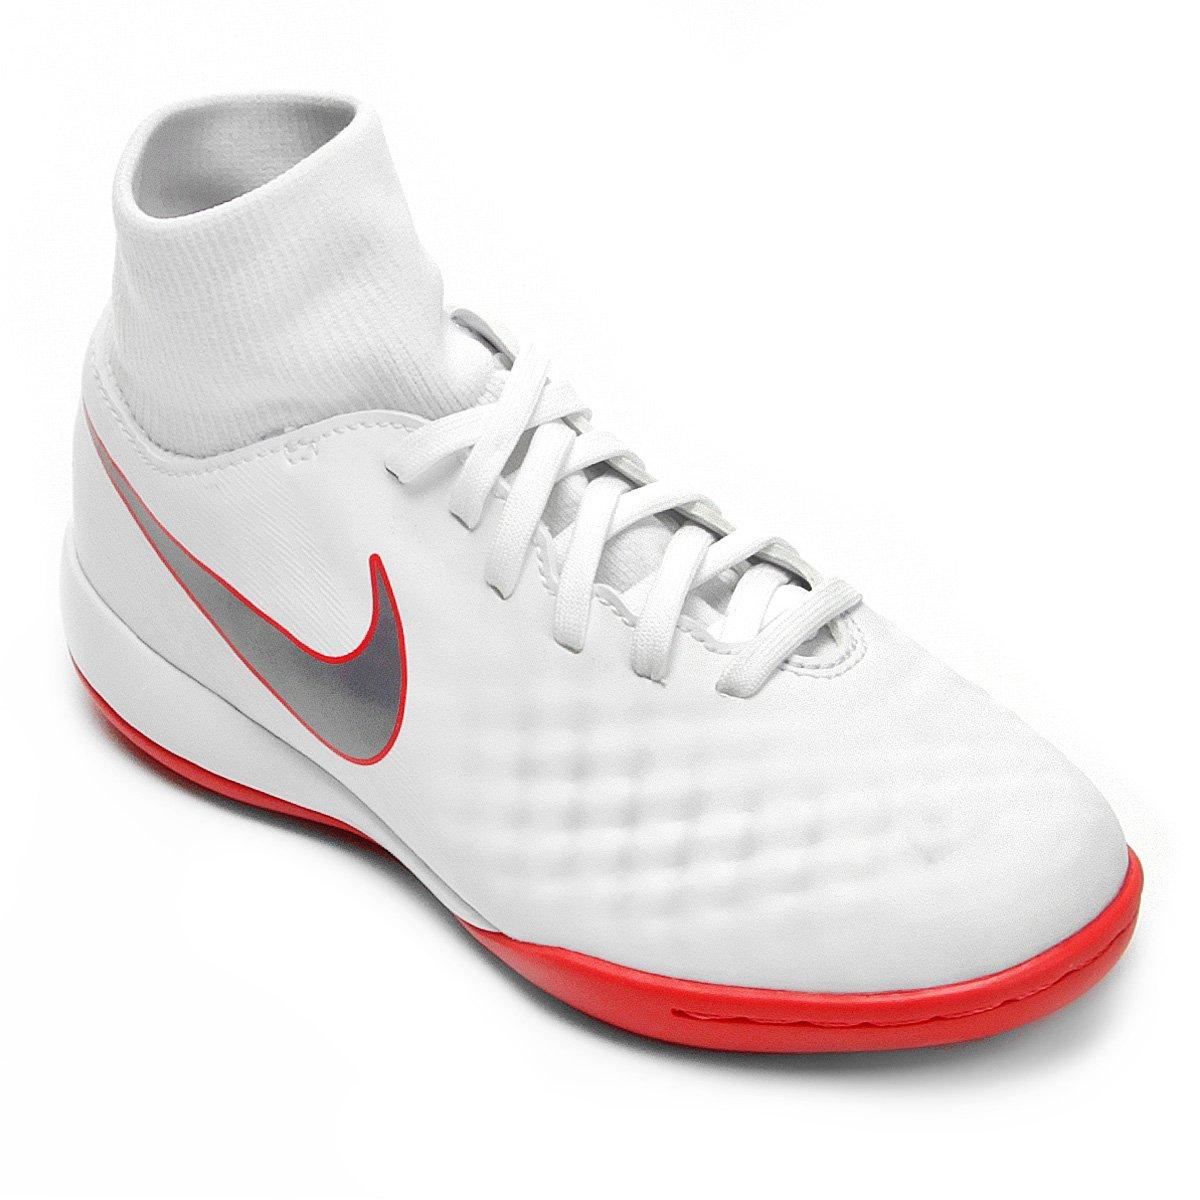 65764d5e43772 Chuteira Futsal Nike Magista Obra 2 Academy Dinamic Fit Infantil - Compre  Agora